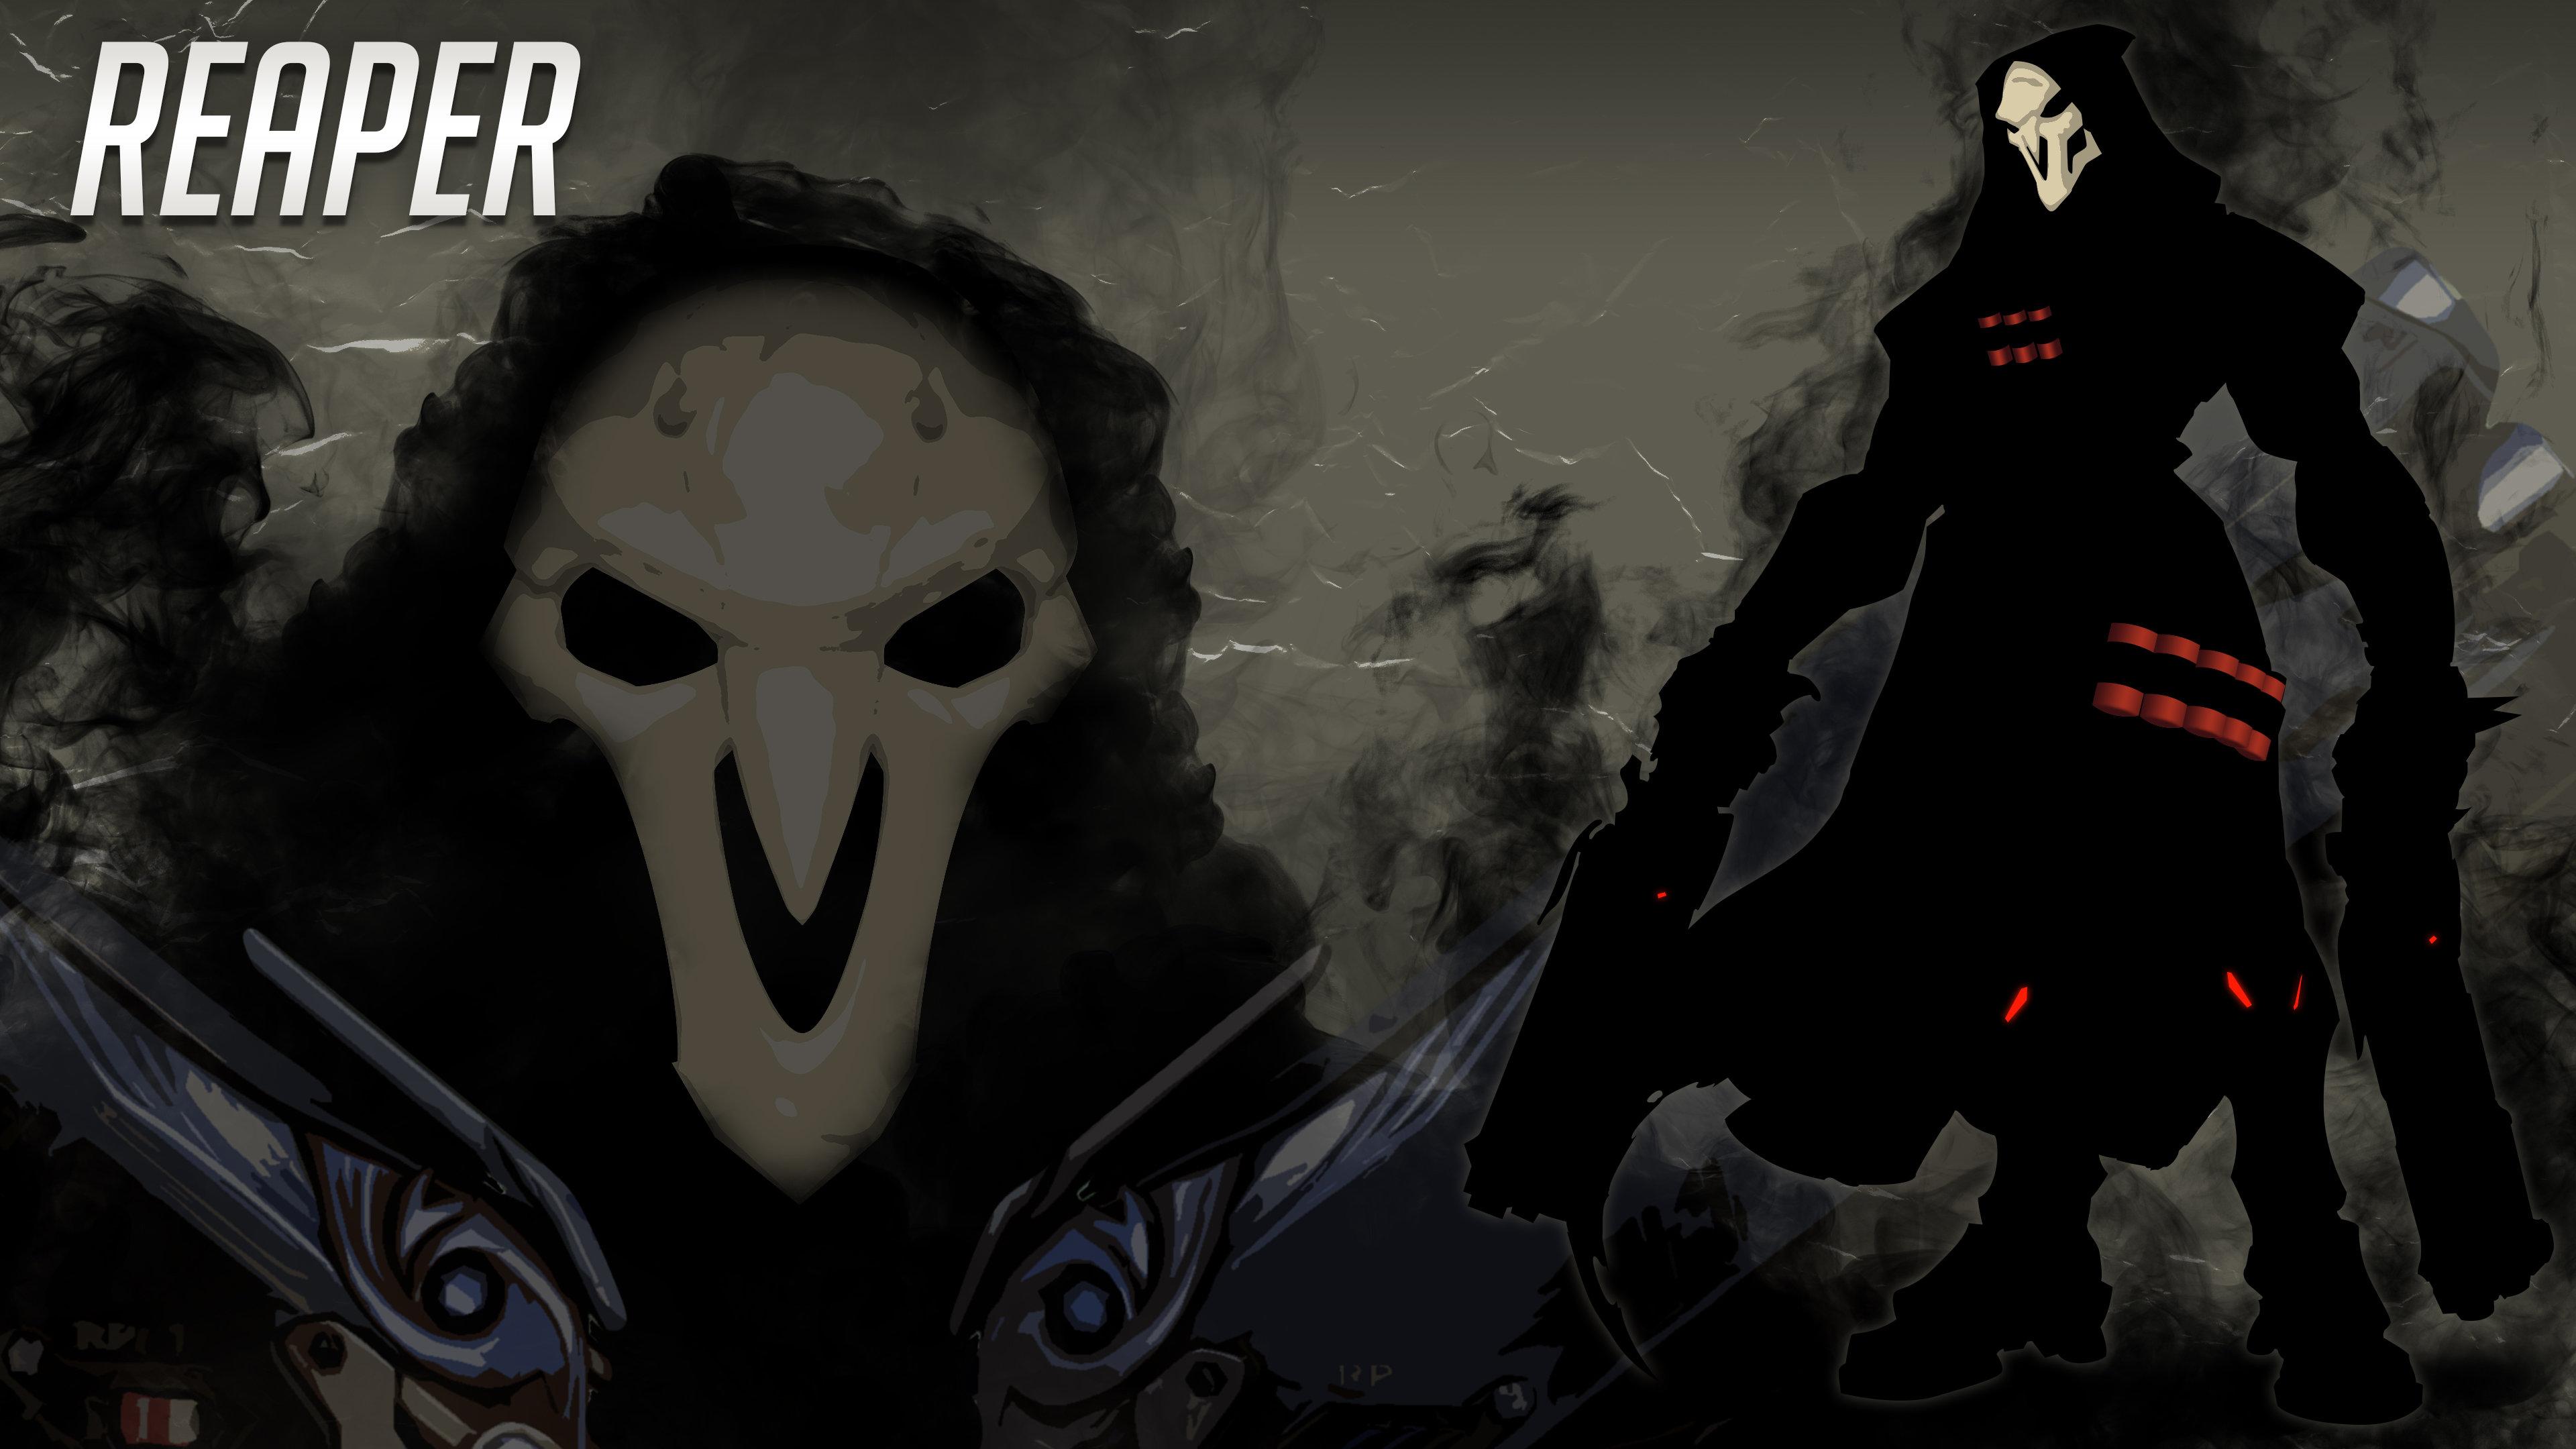 Reaper Overwatch Wallpapers 3840x2160 Ultra Hd 4k Desktop